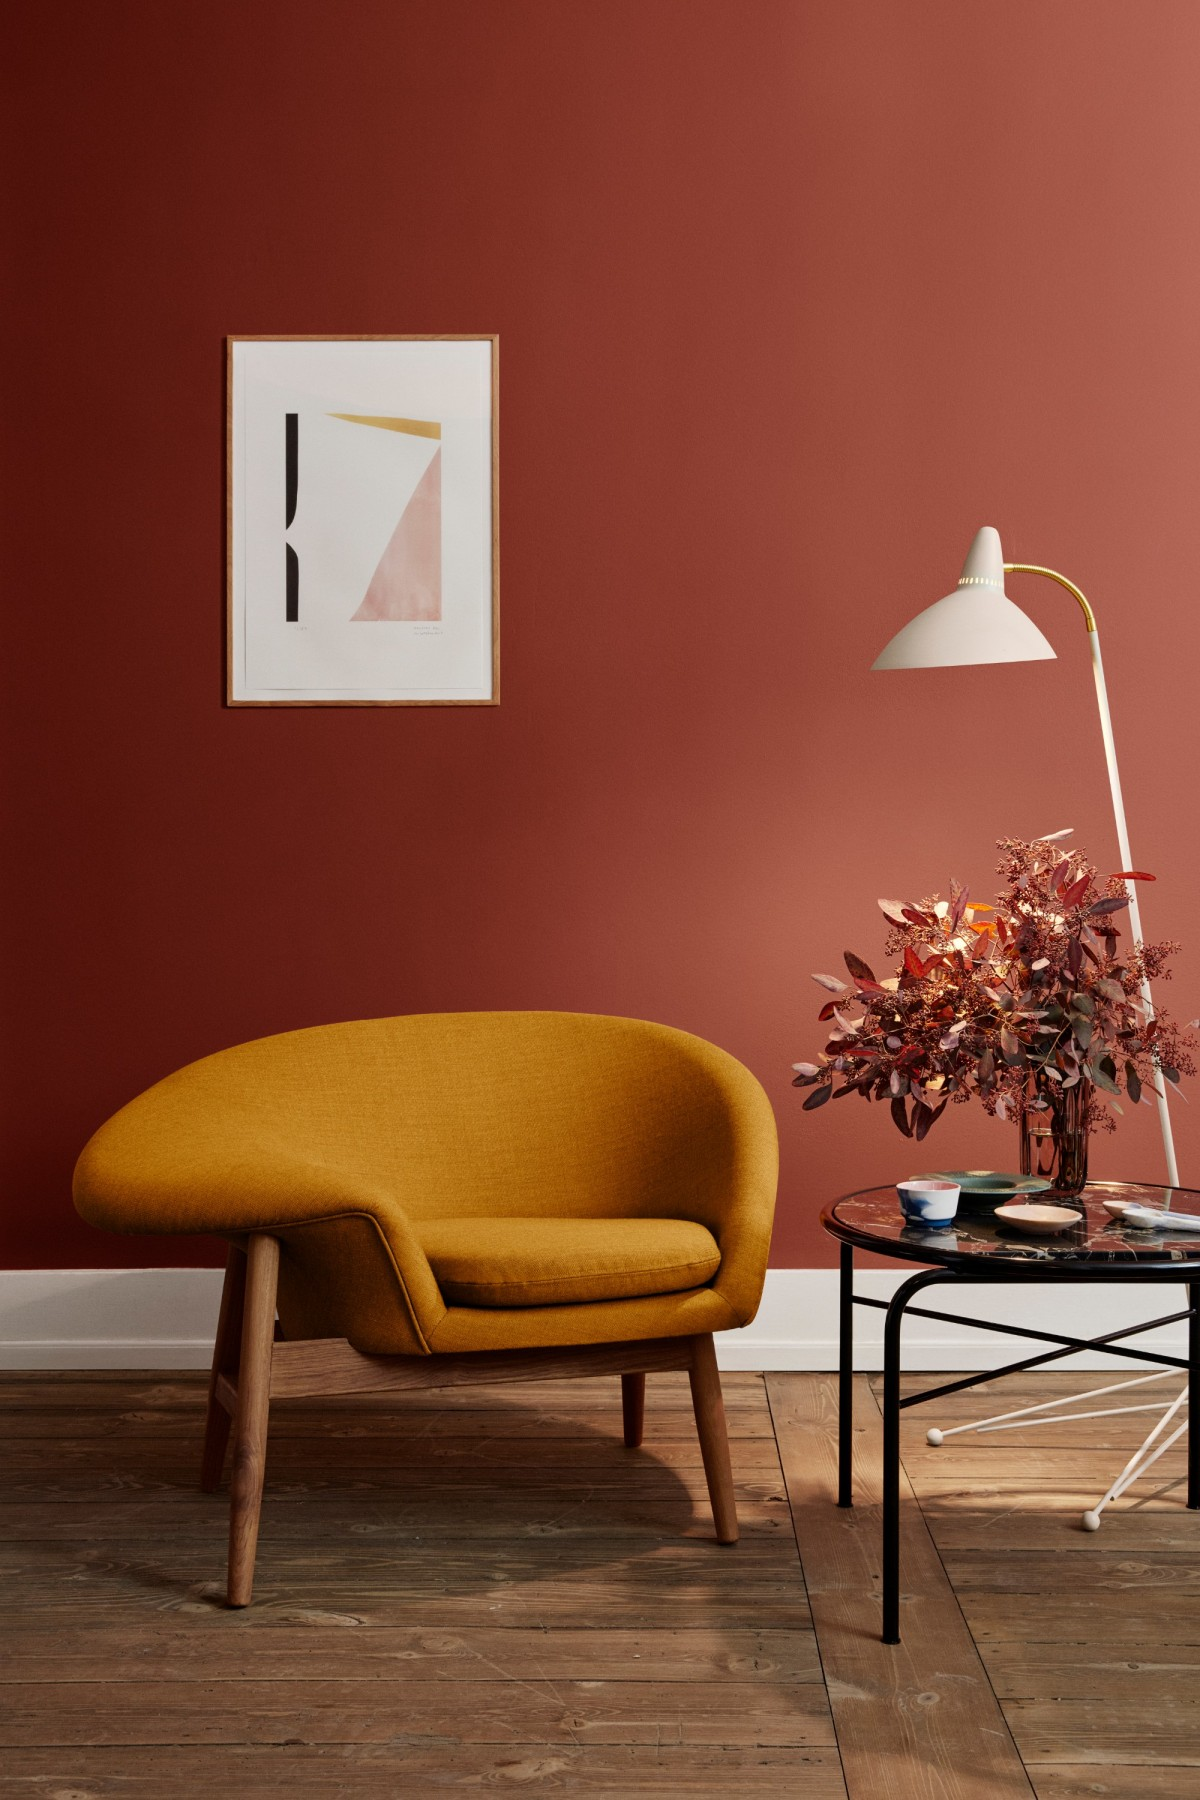 Hans Olsen 'Fried Egg' Lounge Chair Image Credit: Warm Nordic